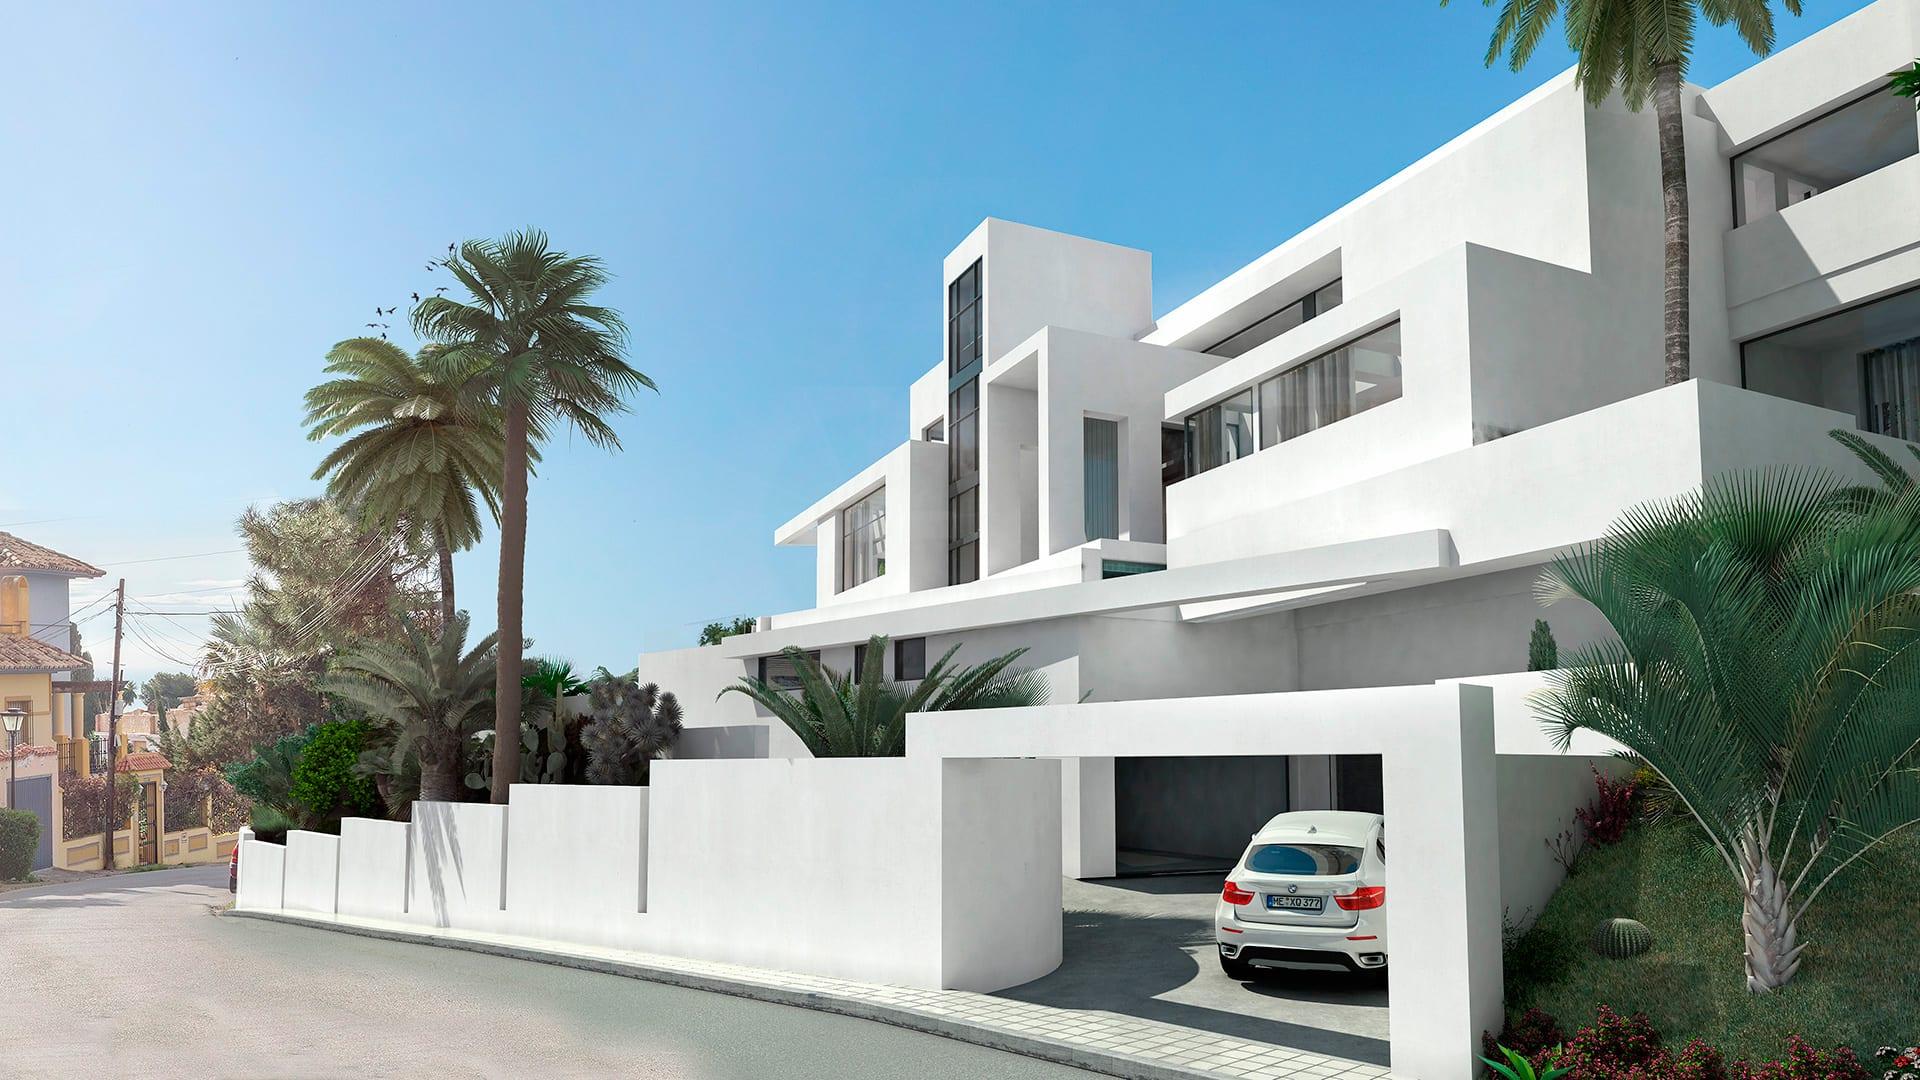 villa moderne nueva andalucia avec vue sur la mer marbella. Black Bedroom Furniture Sets. Home Design Ideas